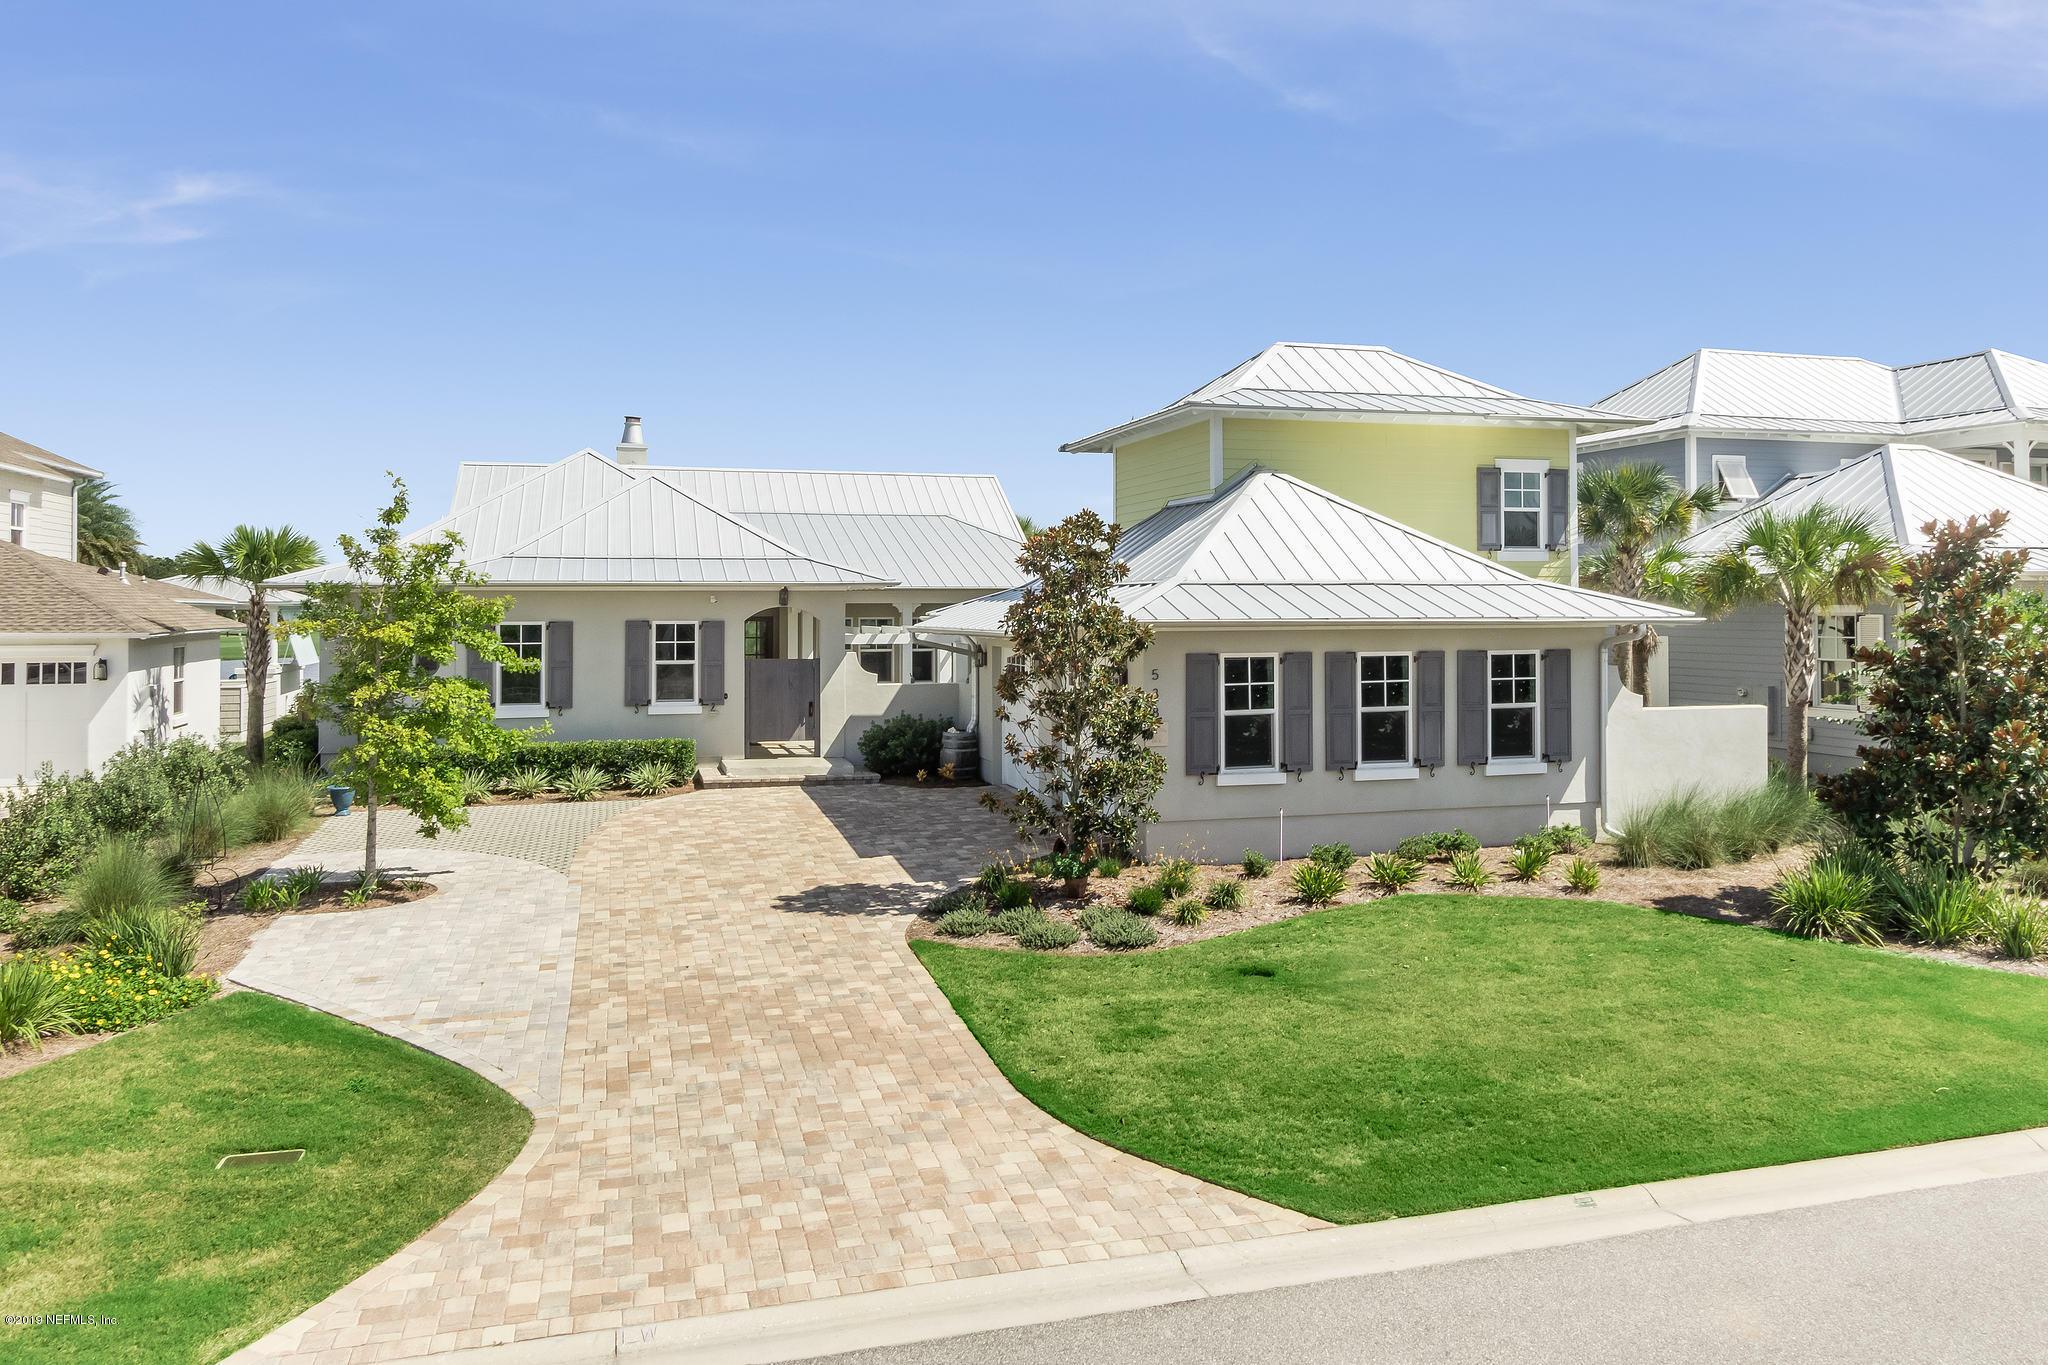 538 ATLANTIC BEACH, ATLANTIC BEACH, FLORIDA 32233, 3 Bedrooms Bedrooms, ,3 BathroomsBathrooms,Residential,For sale,ATLANTIC BEACH,1009666